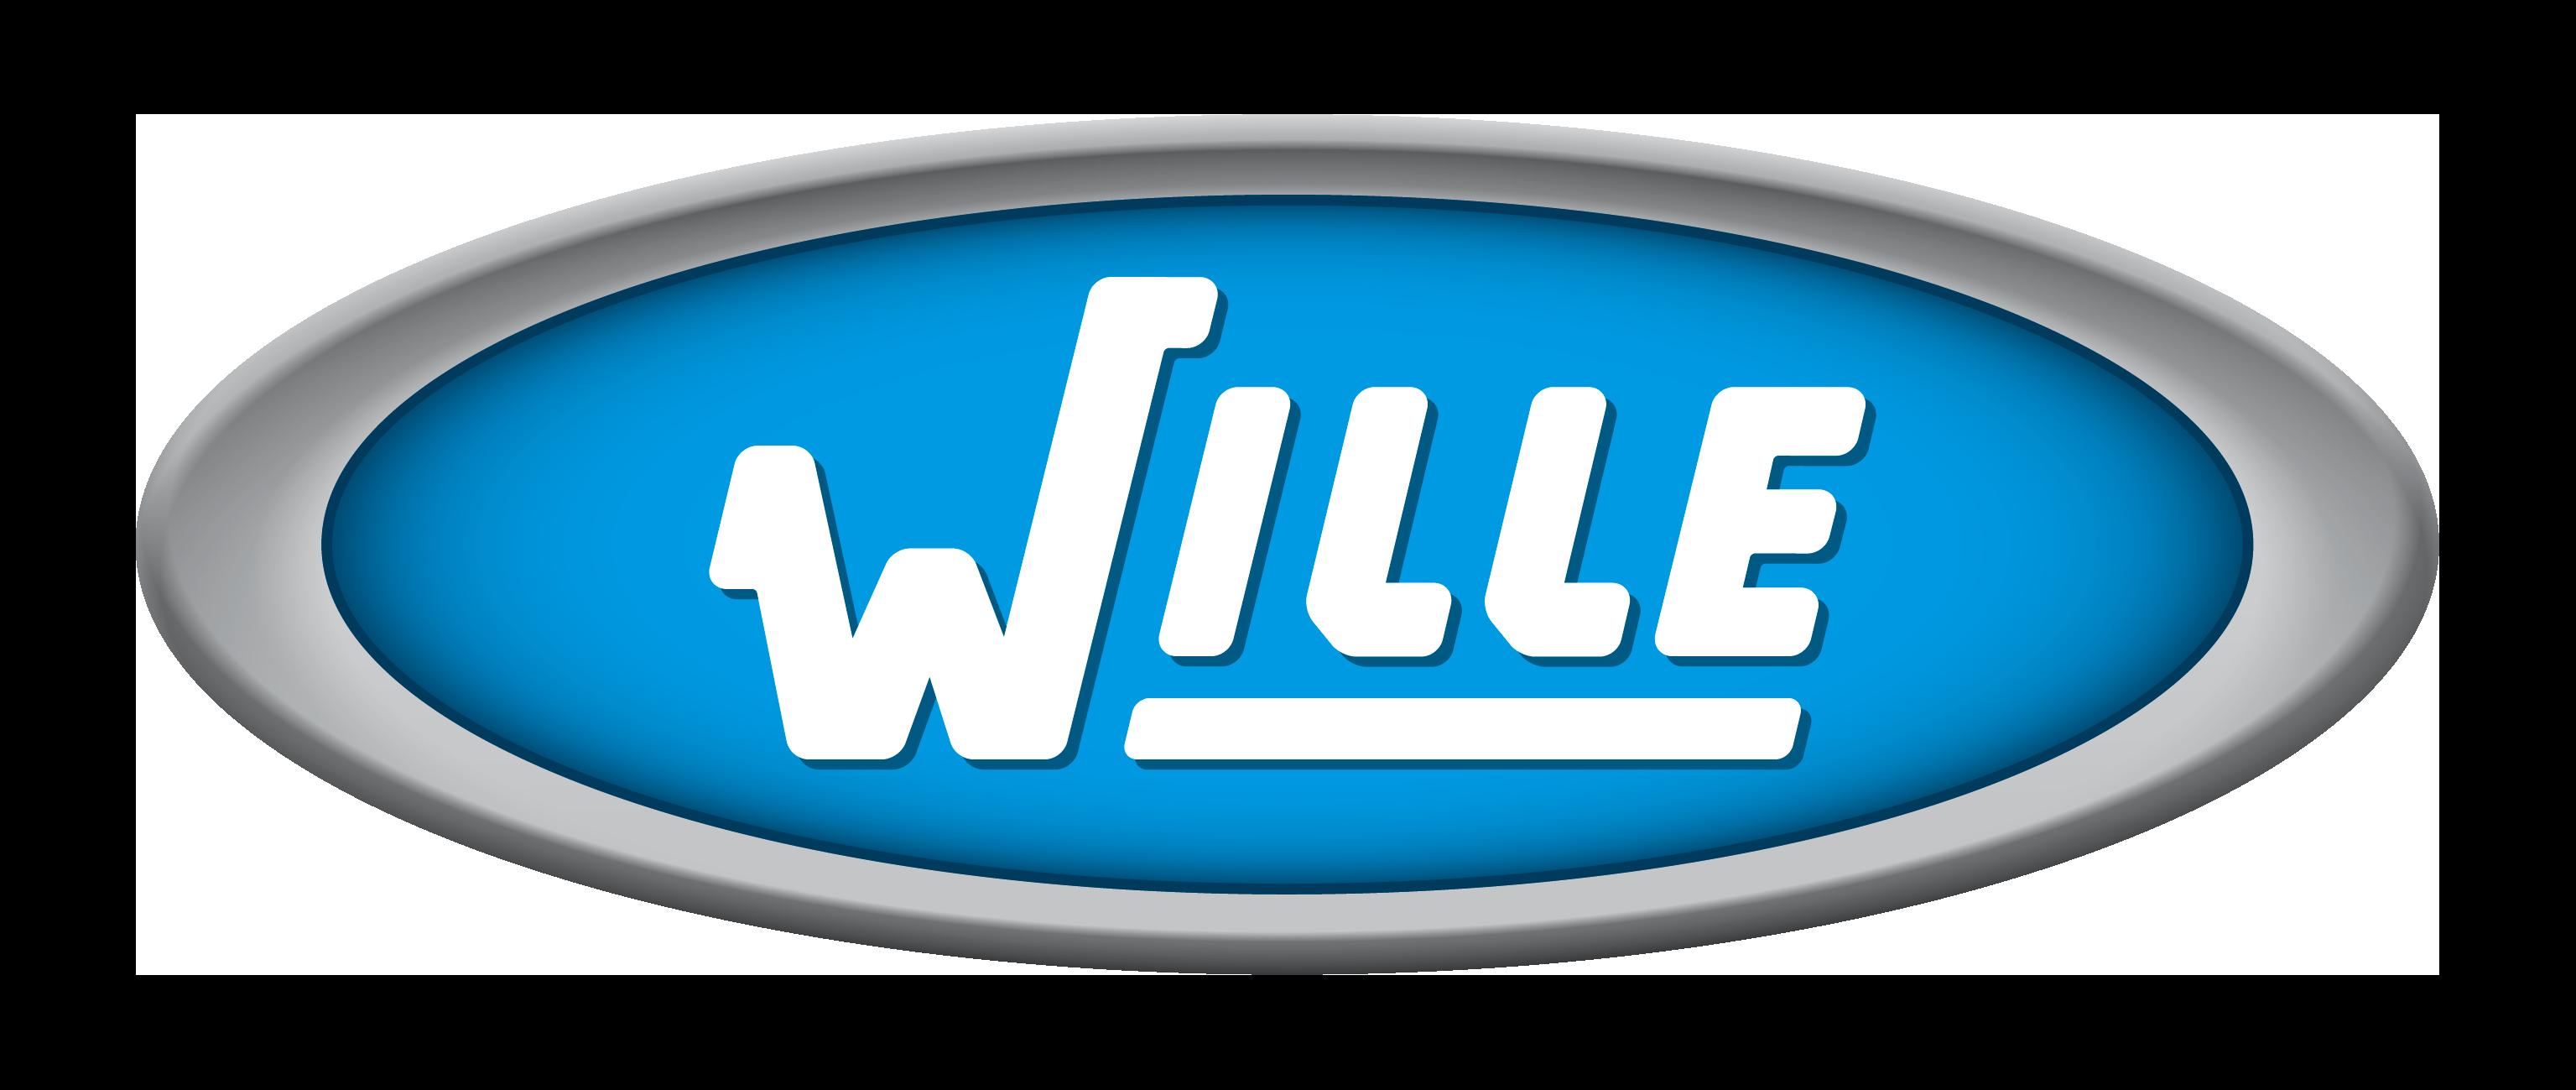 WILLE - MULTIFUNCTIONAL EQUIPMENT LOGO